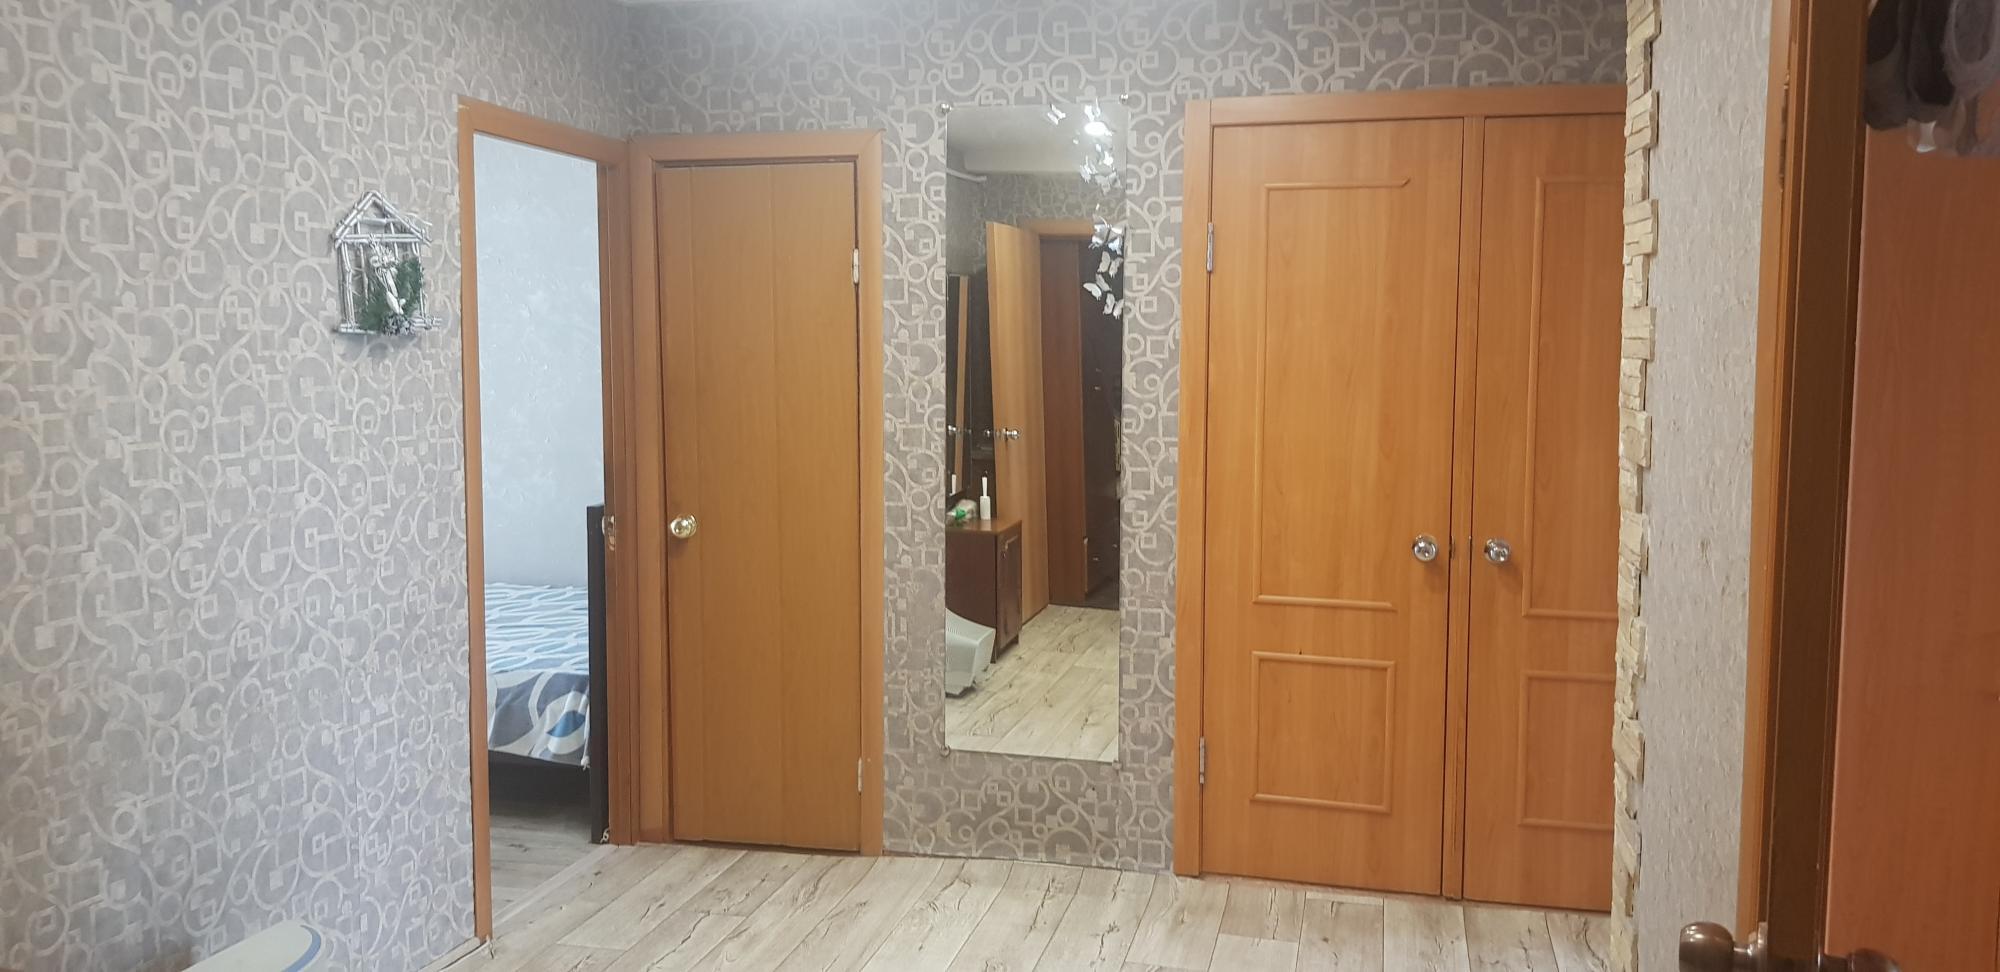 2к квартира улица Краснодарская, 3 | 18000 | аренда в Красноярске фото 12